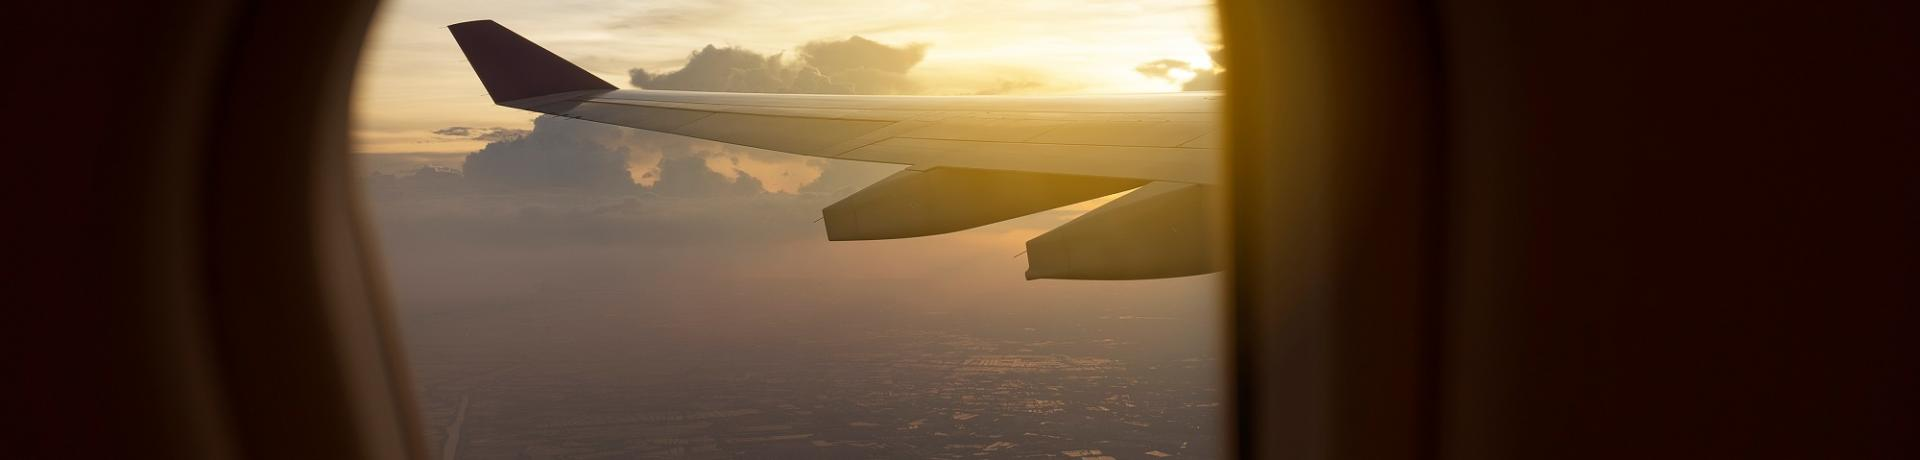 Flugzeug-Sonnenuntergang_GI-959427956.jpg